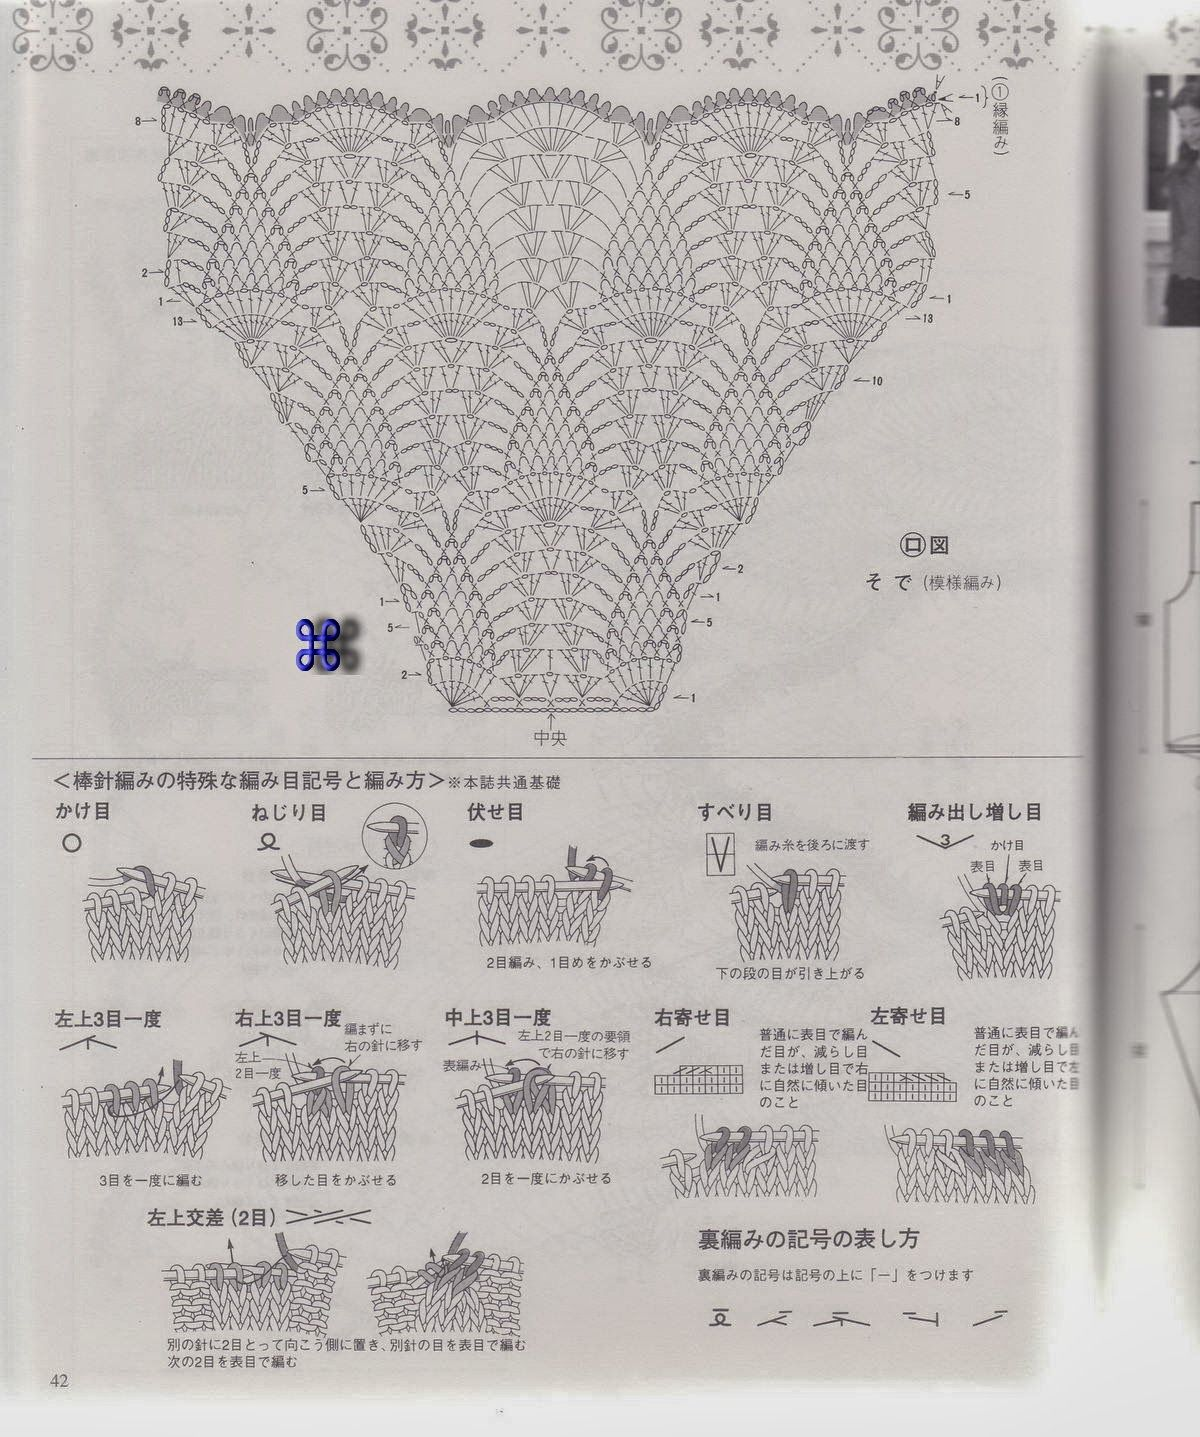 Tunica Picos manga corta Patron - Patrones Crochet | Crochet ...